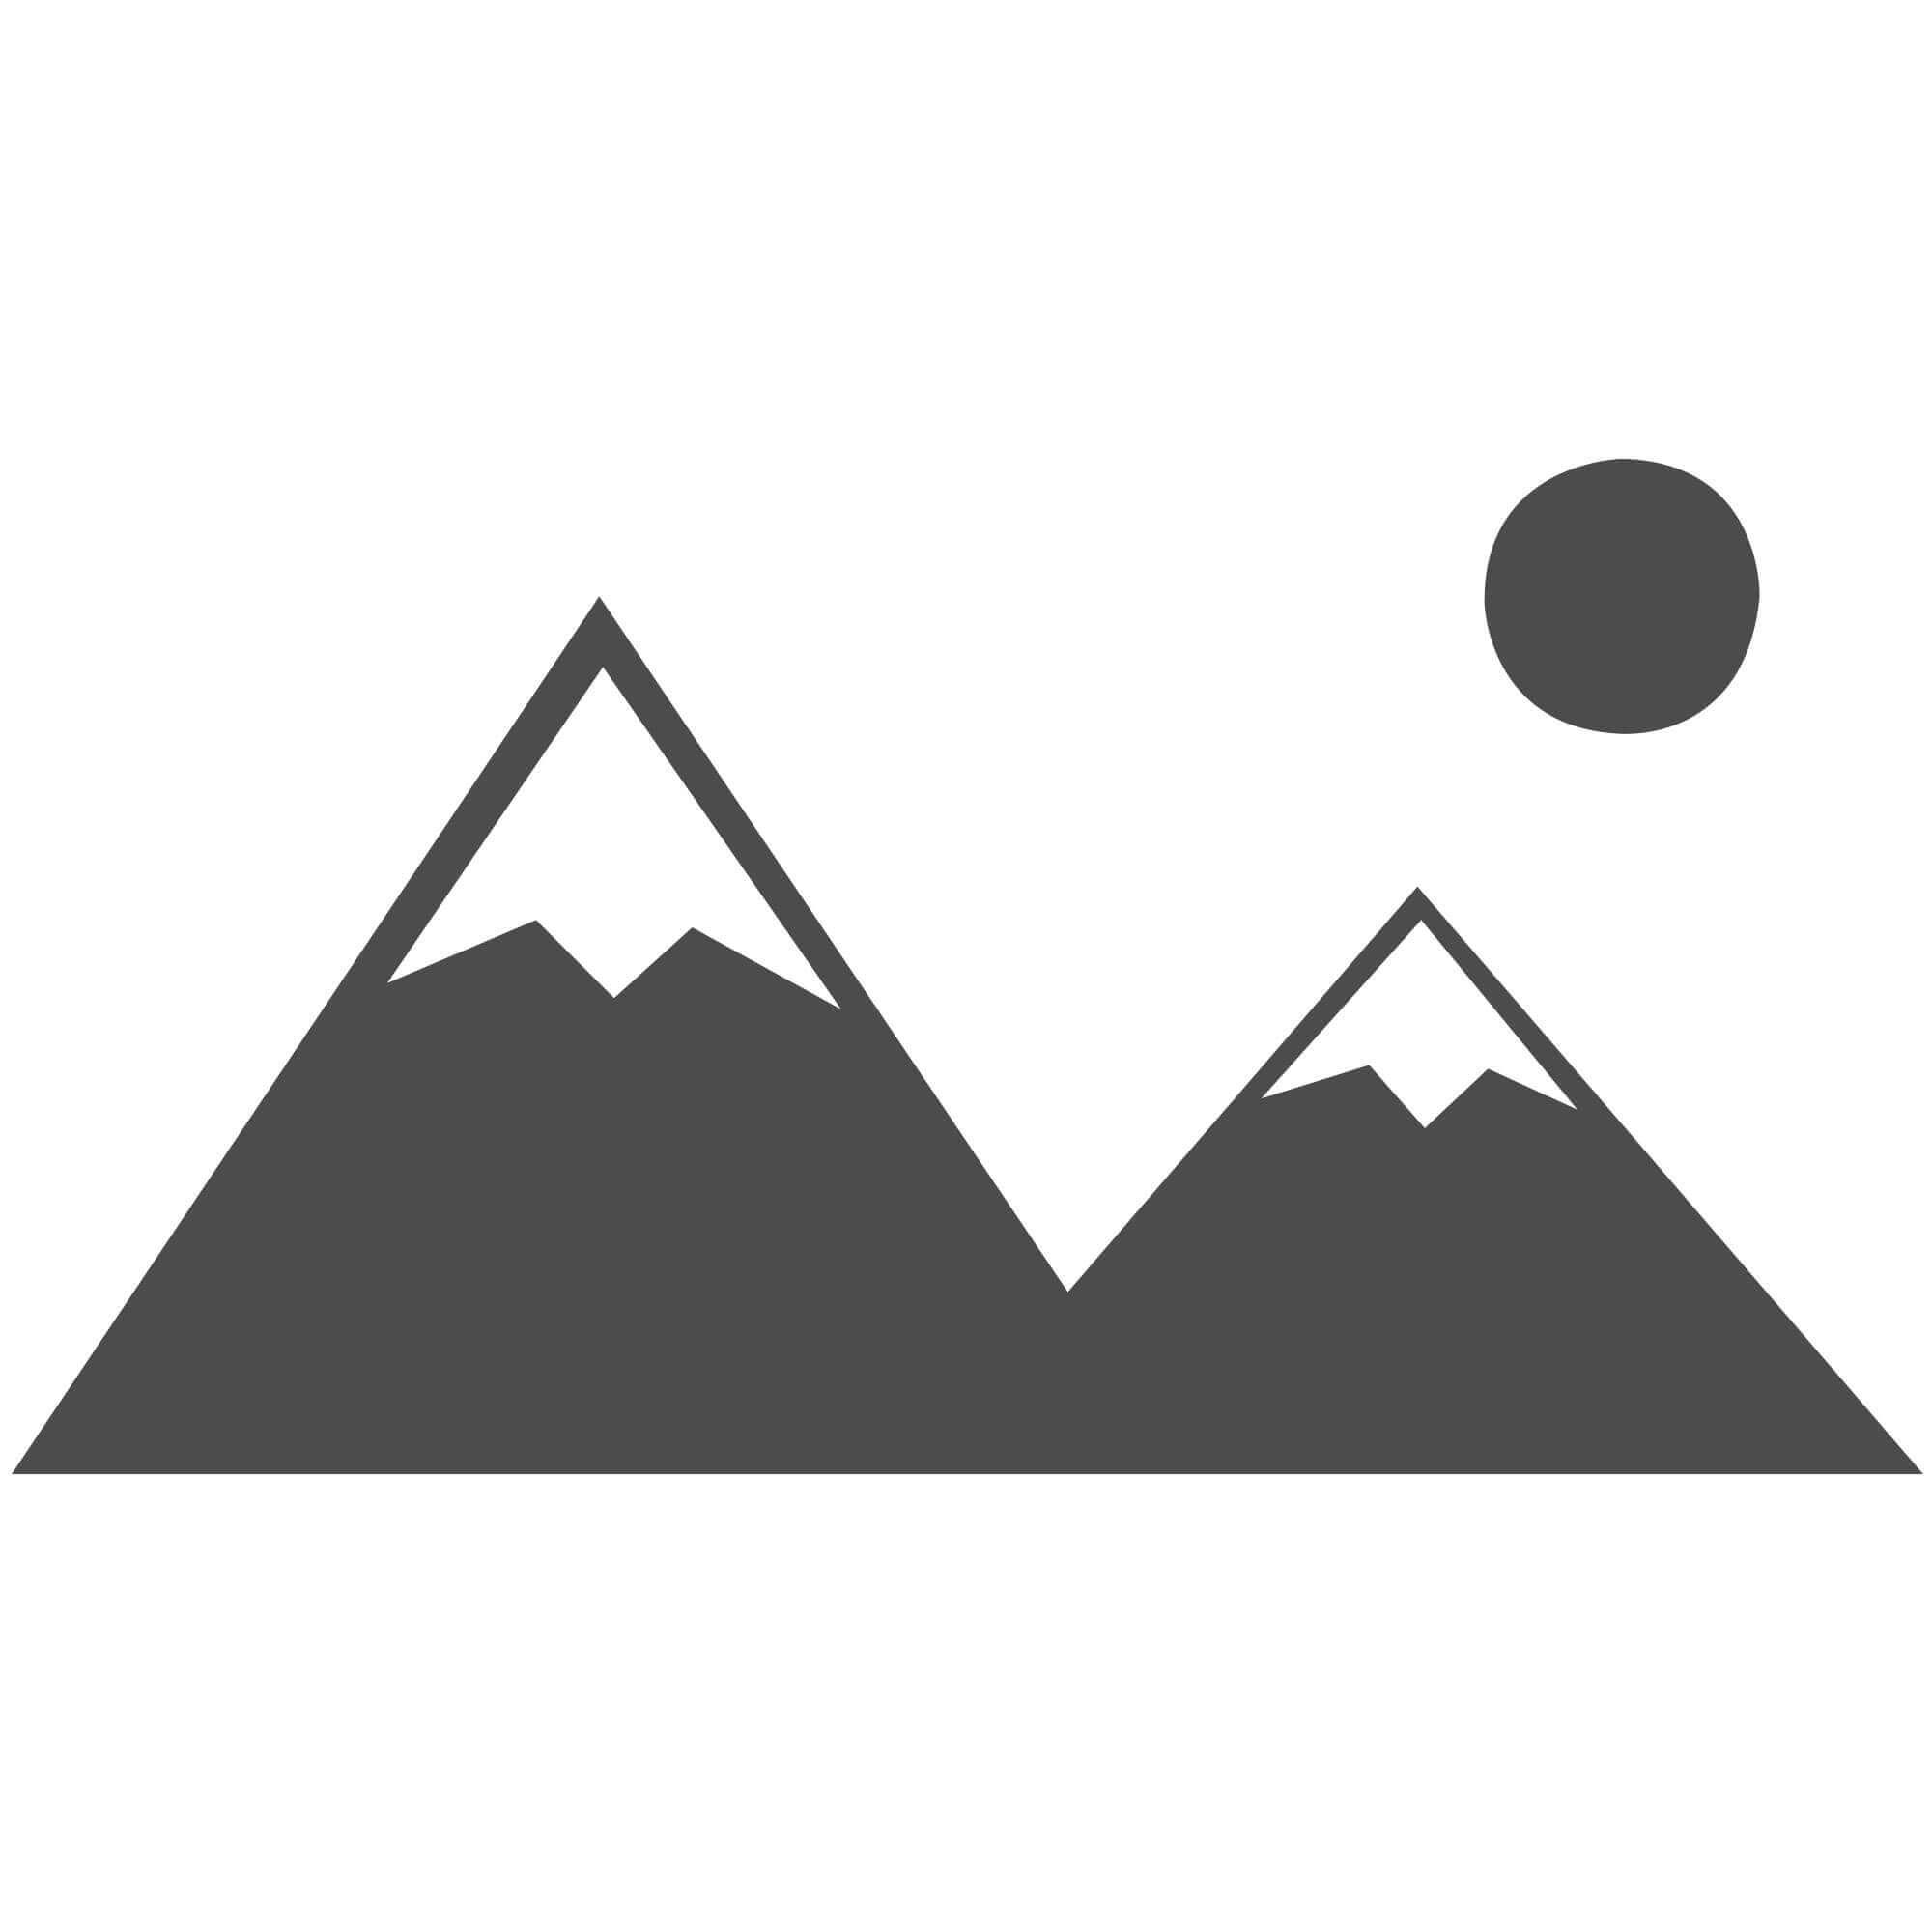 "Cairo Bronze Rug - Size 120 x 170 cm (4' x 5'7"")"